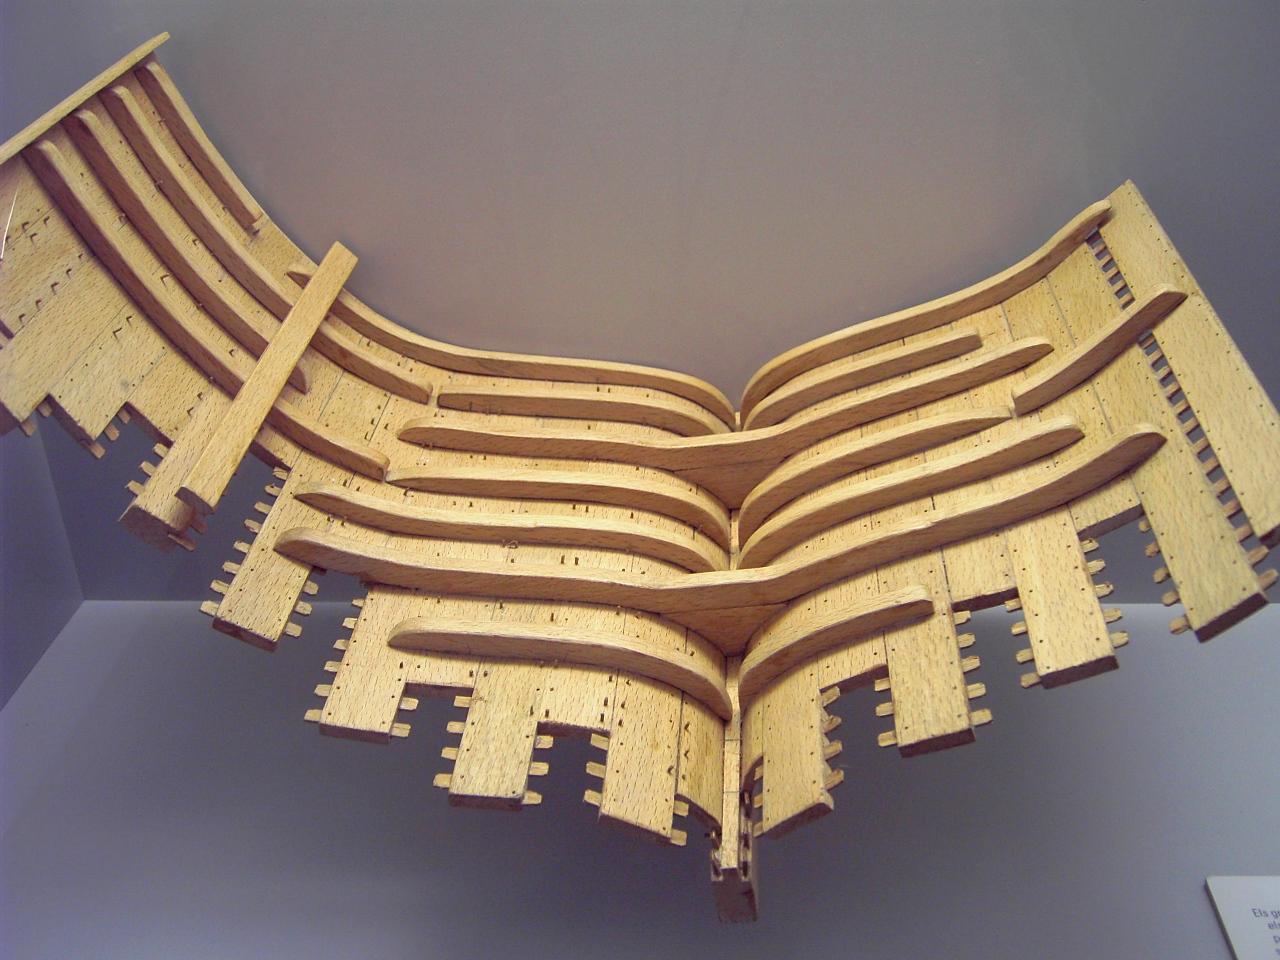 Holz an sich holzeigenschaften rodichte gewicht holz for Holzverbindungen herstellen